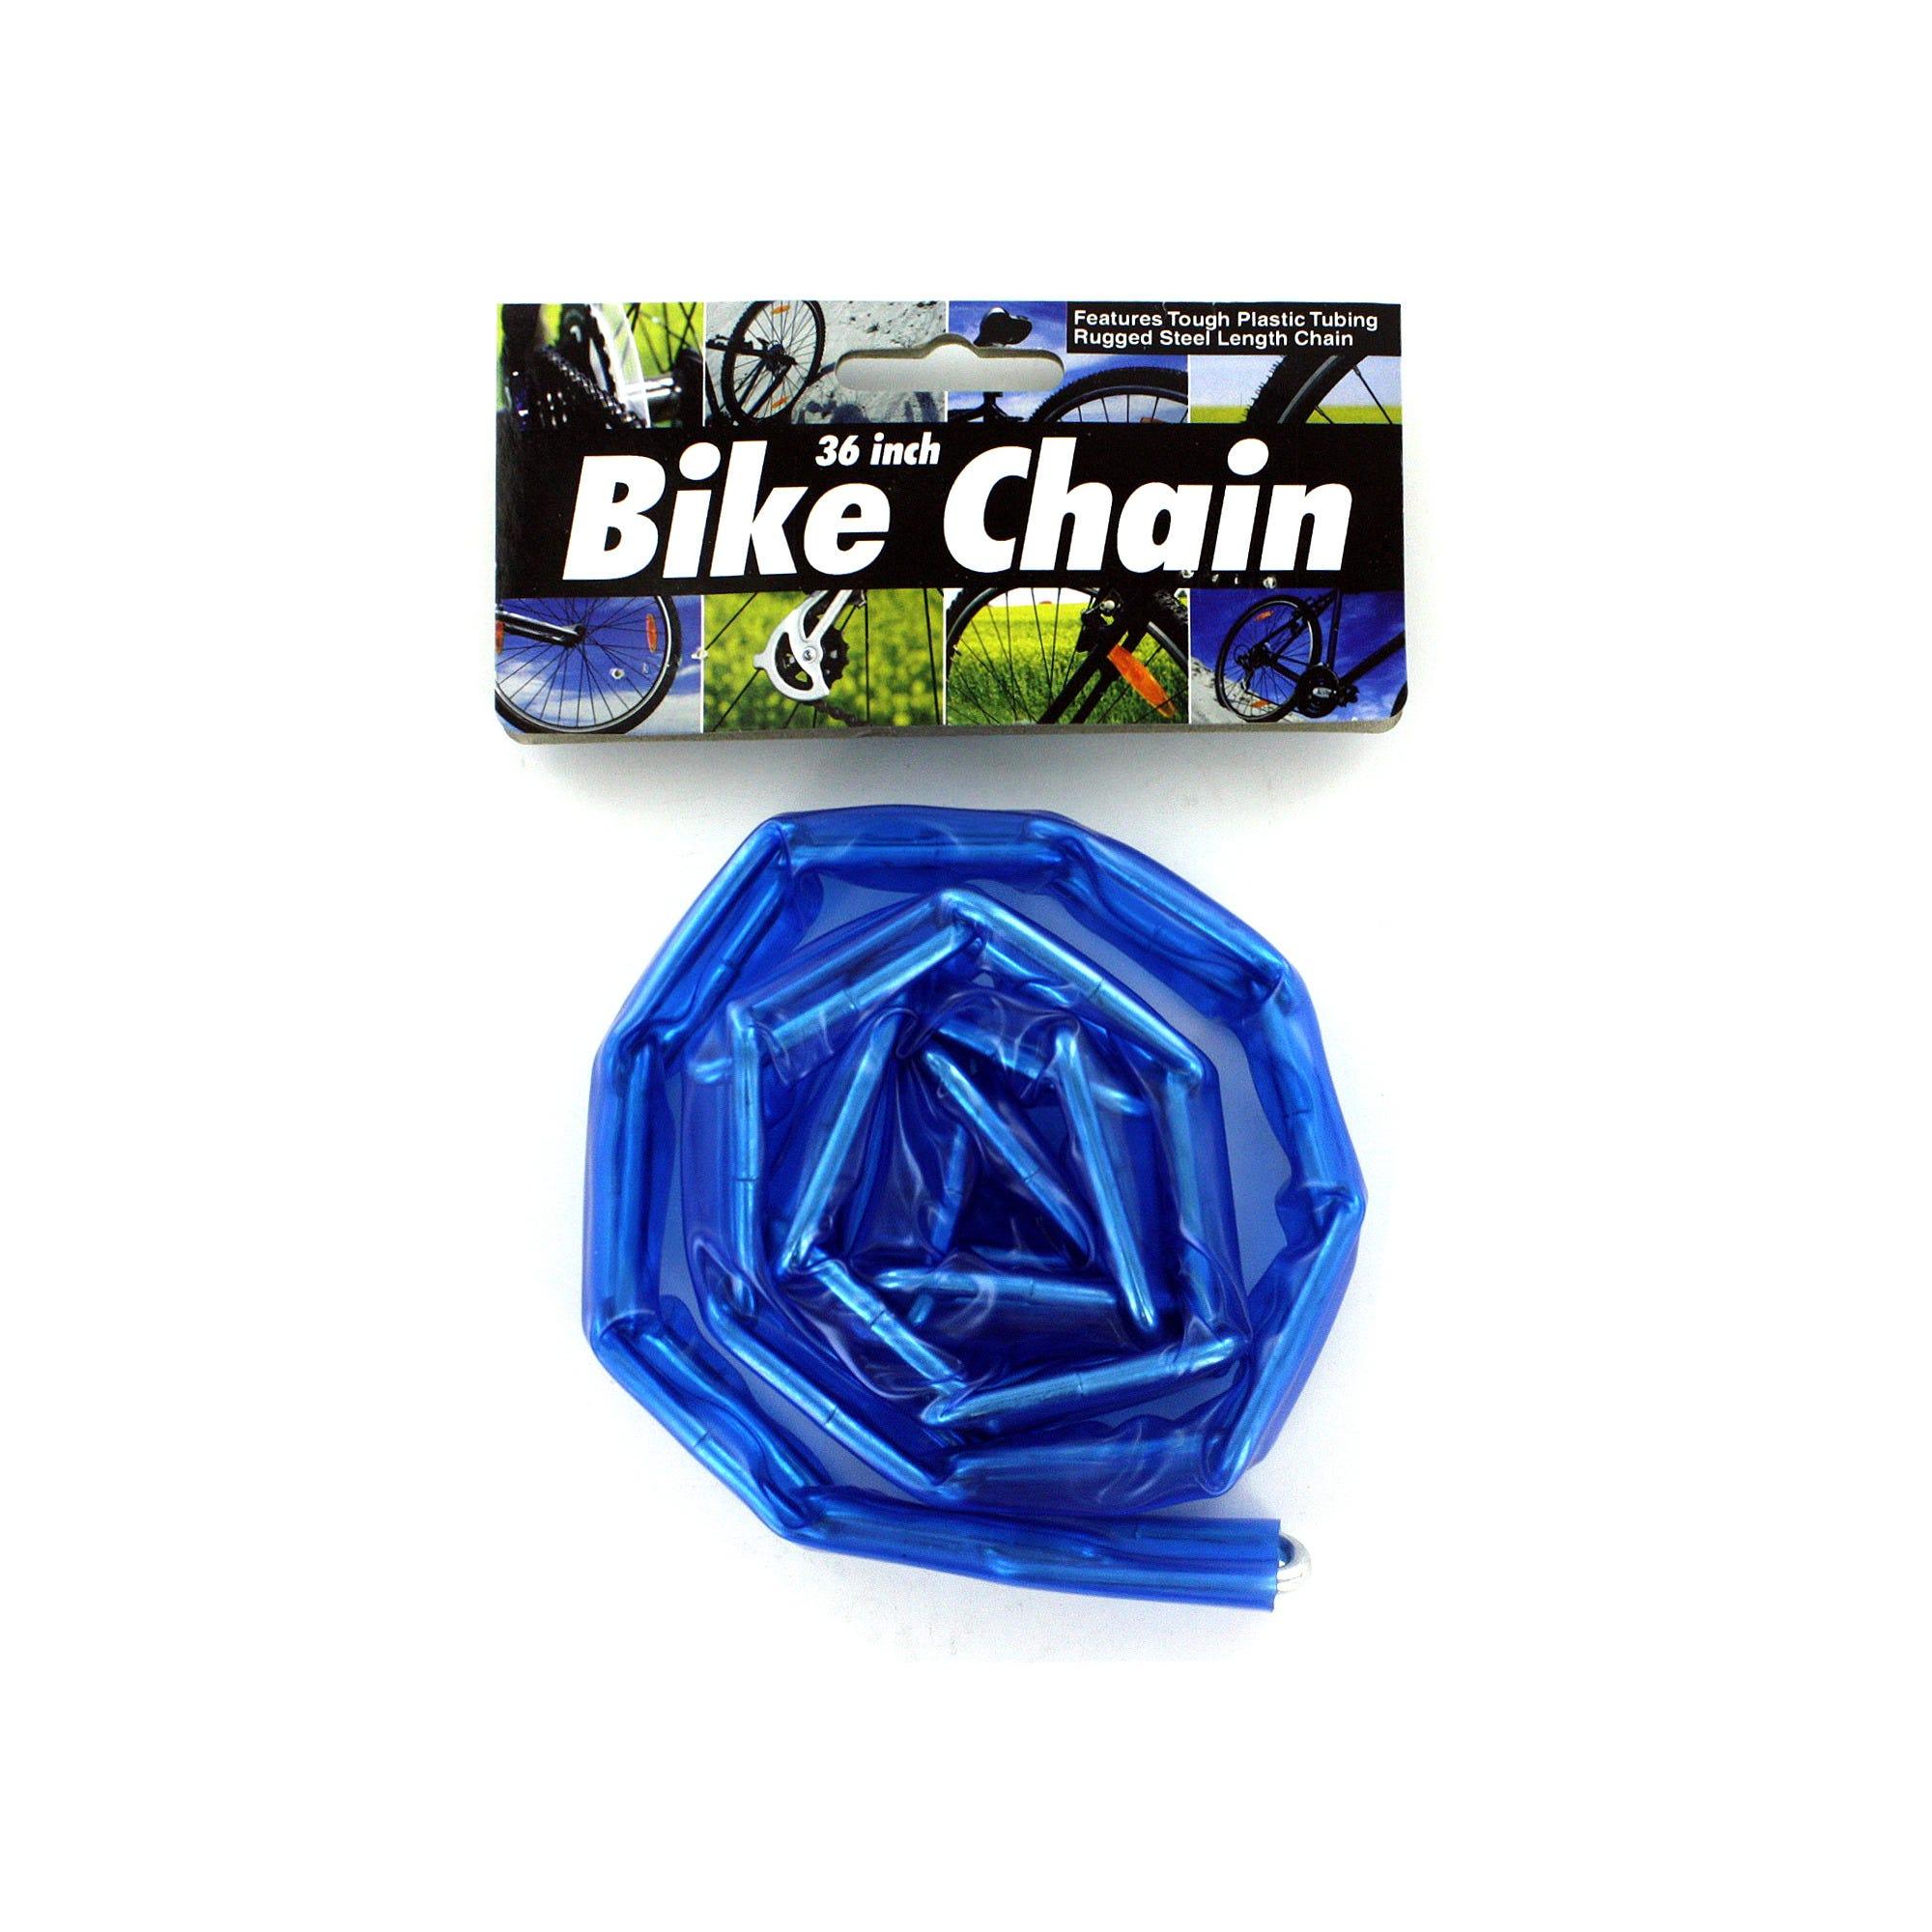 Plastic Coated Bike Chain- Qty 24